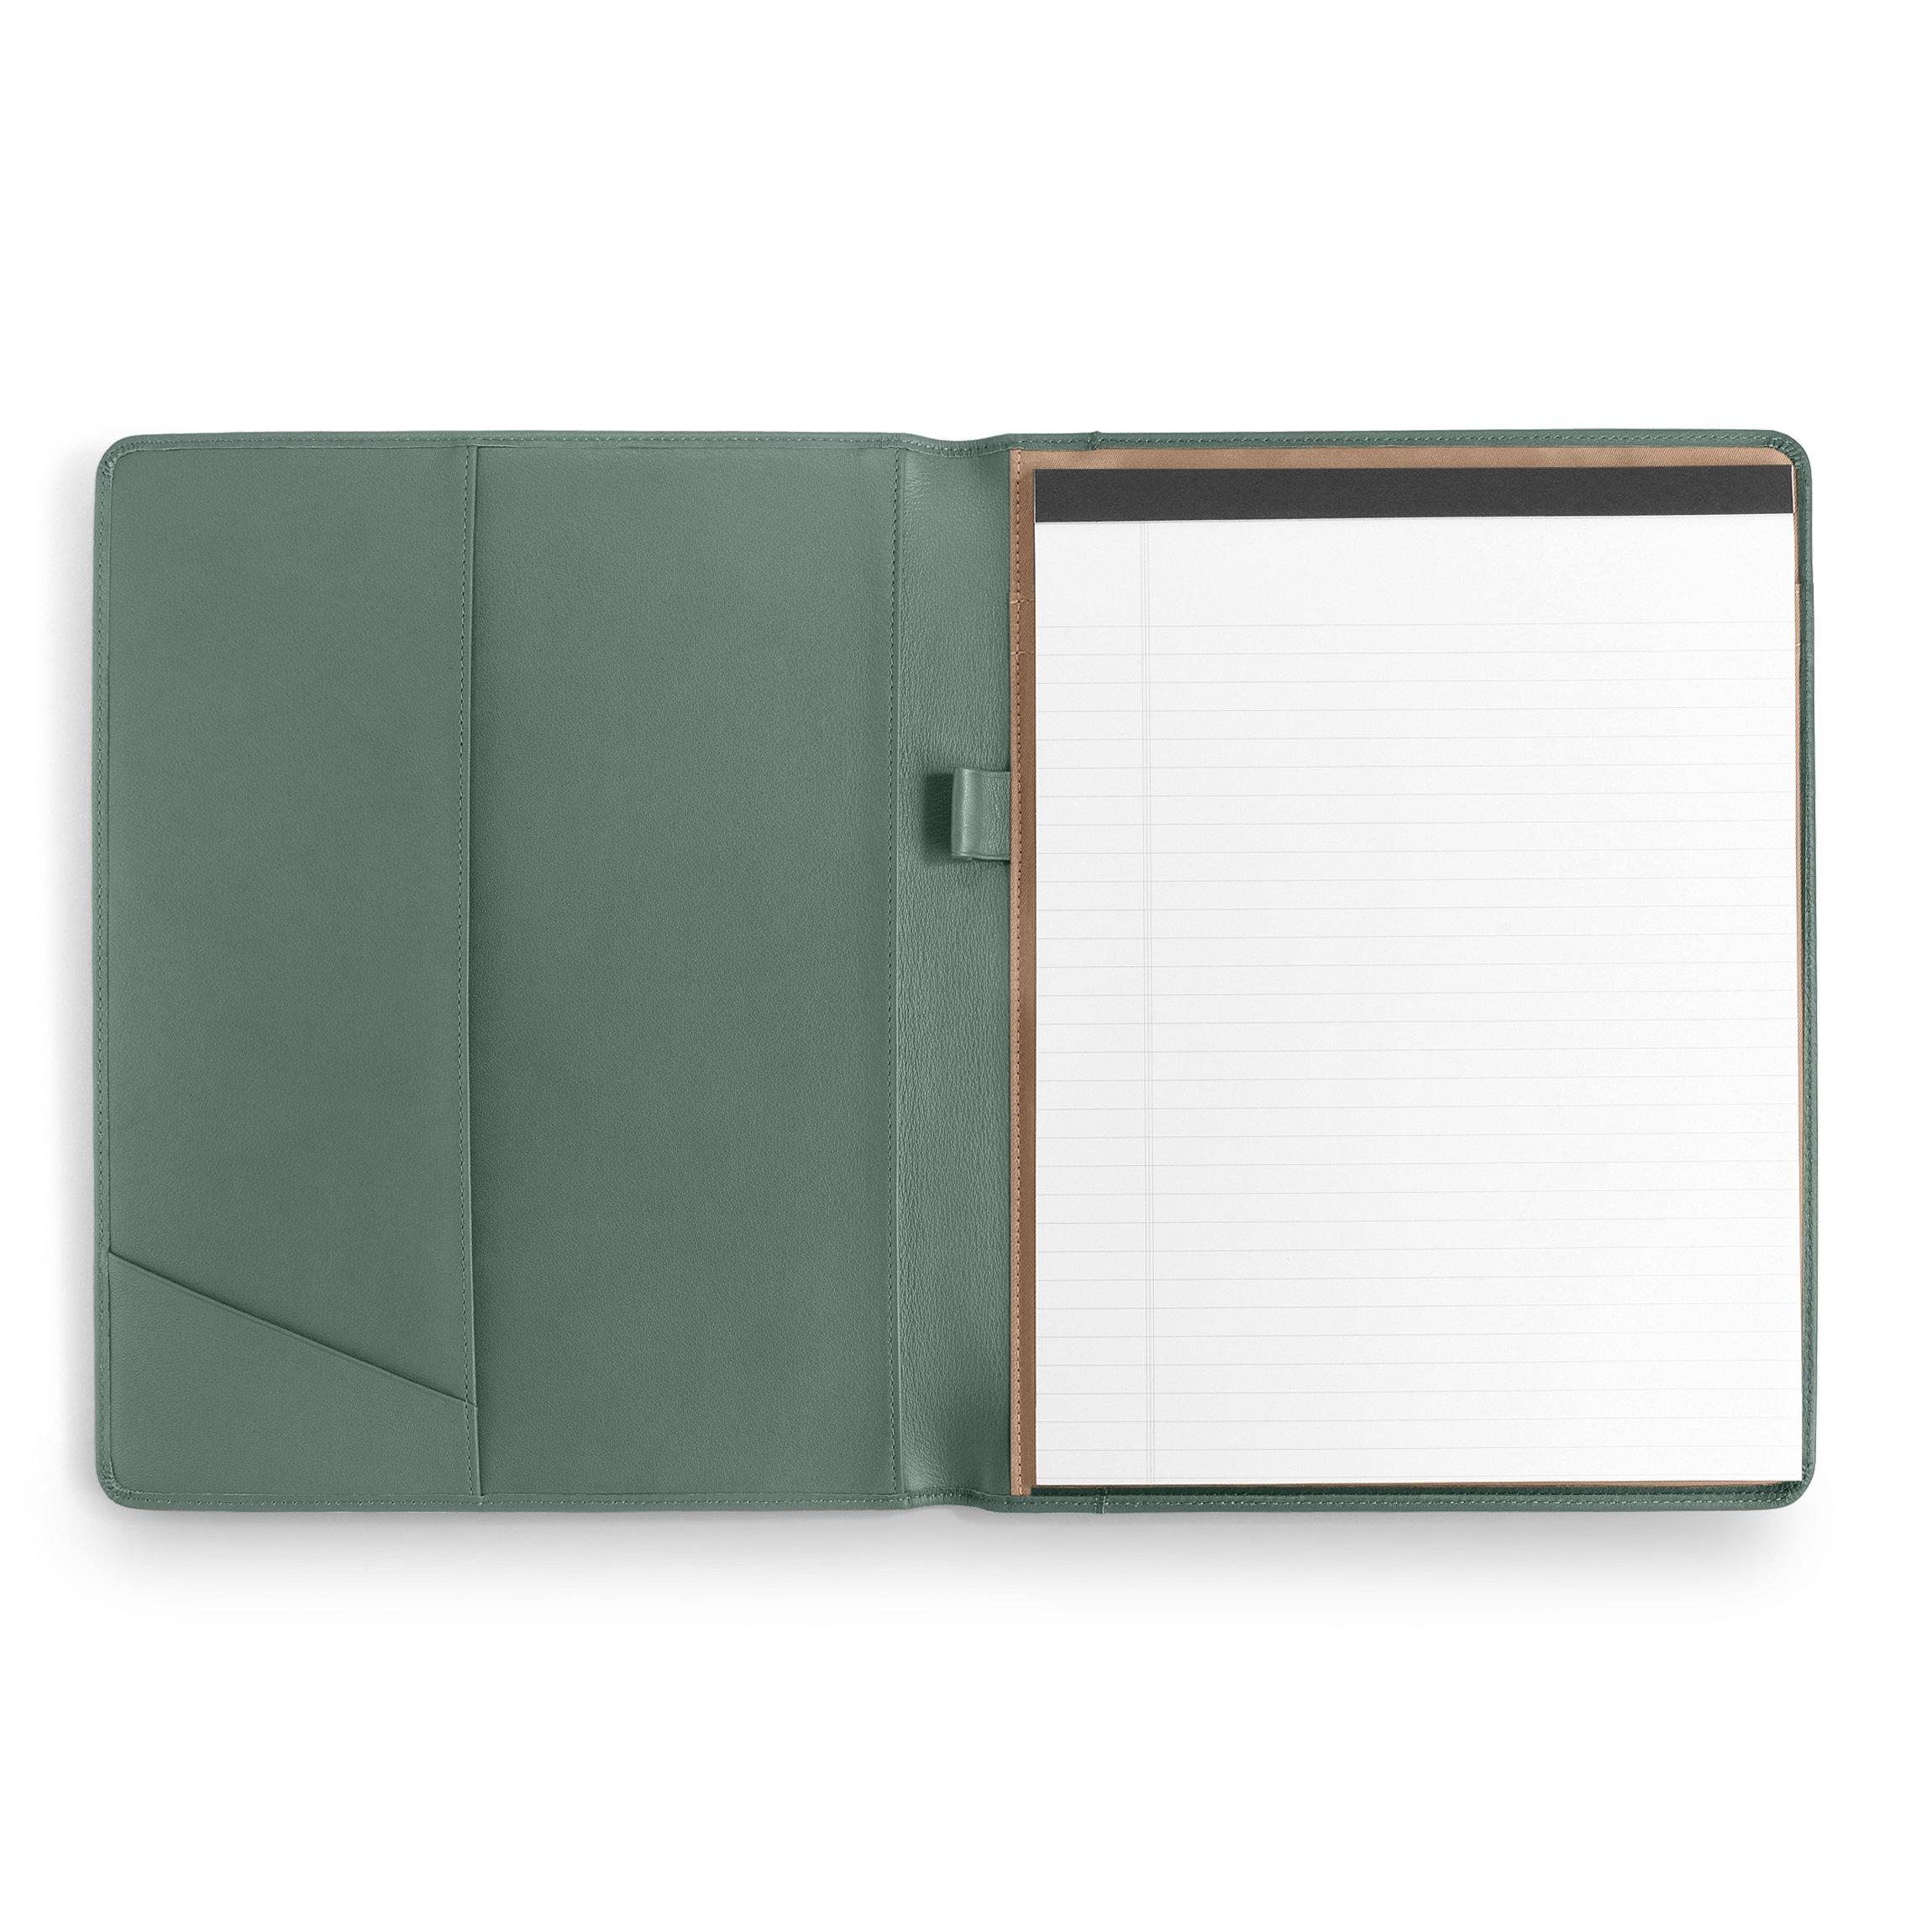 Leatherlogy Standard Padfolio with Pen Loop - Full Grain Leather Leather - Dusk (blue)